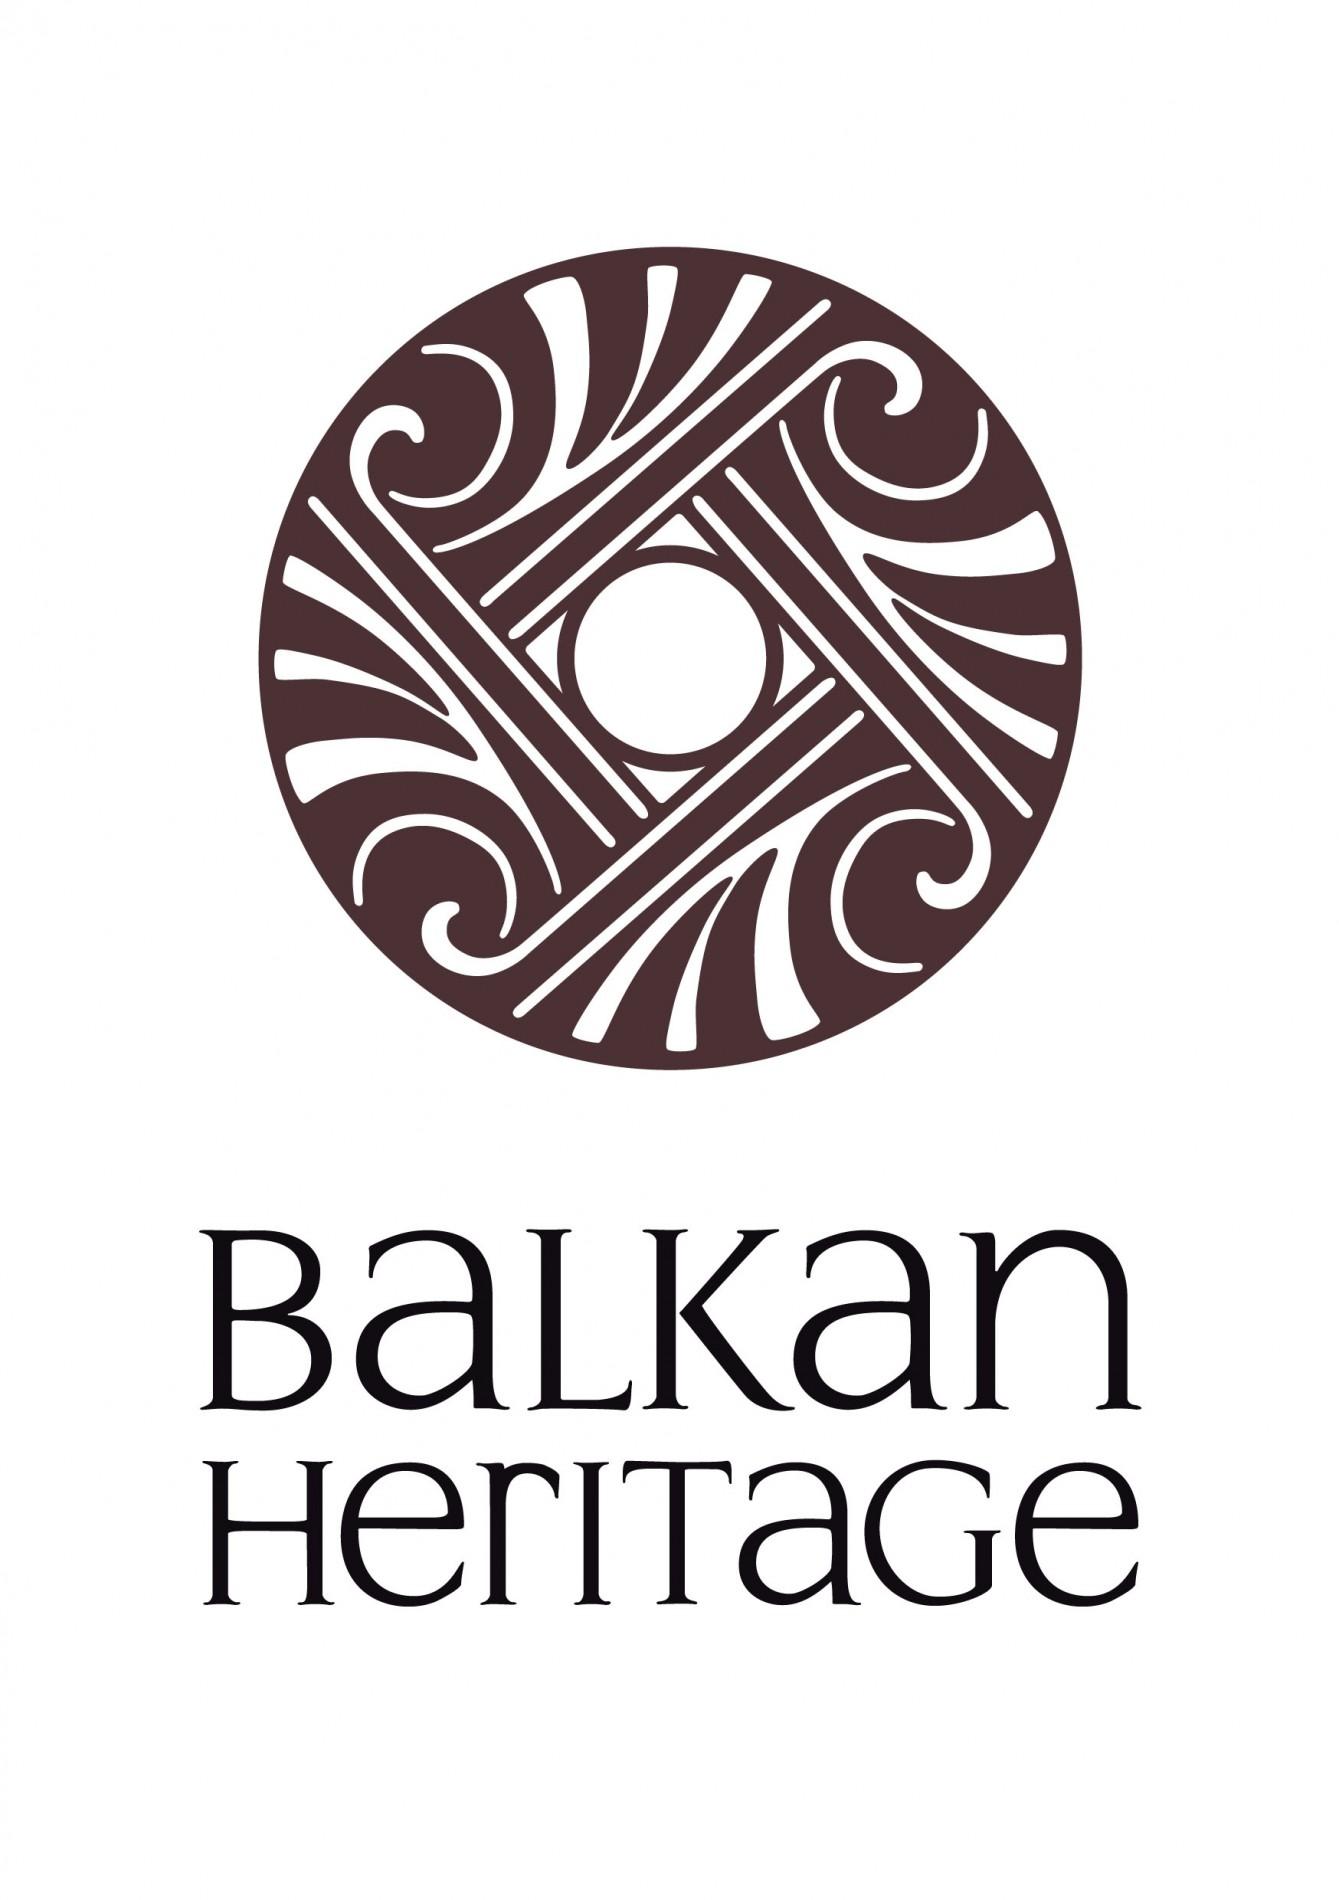 Balkan Heritage Foundation